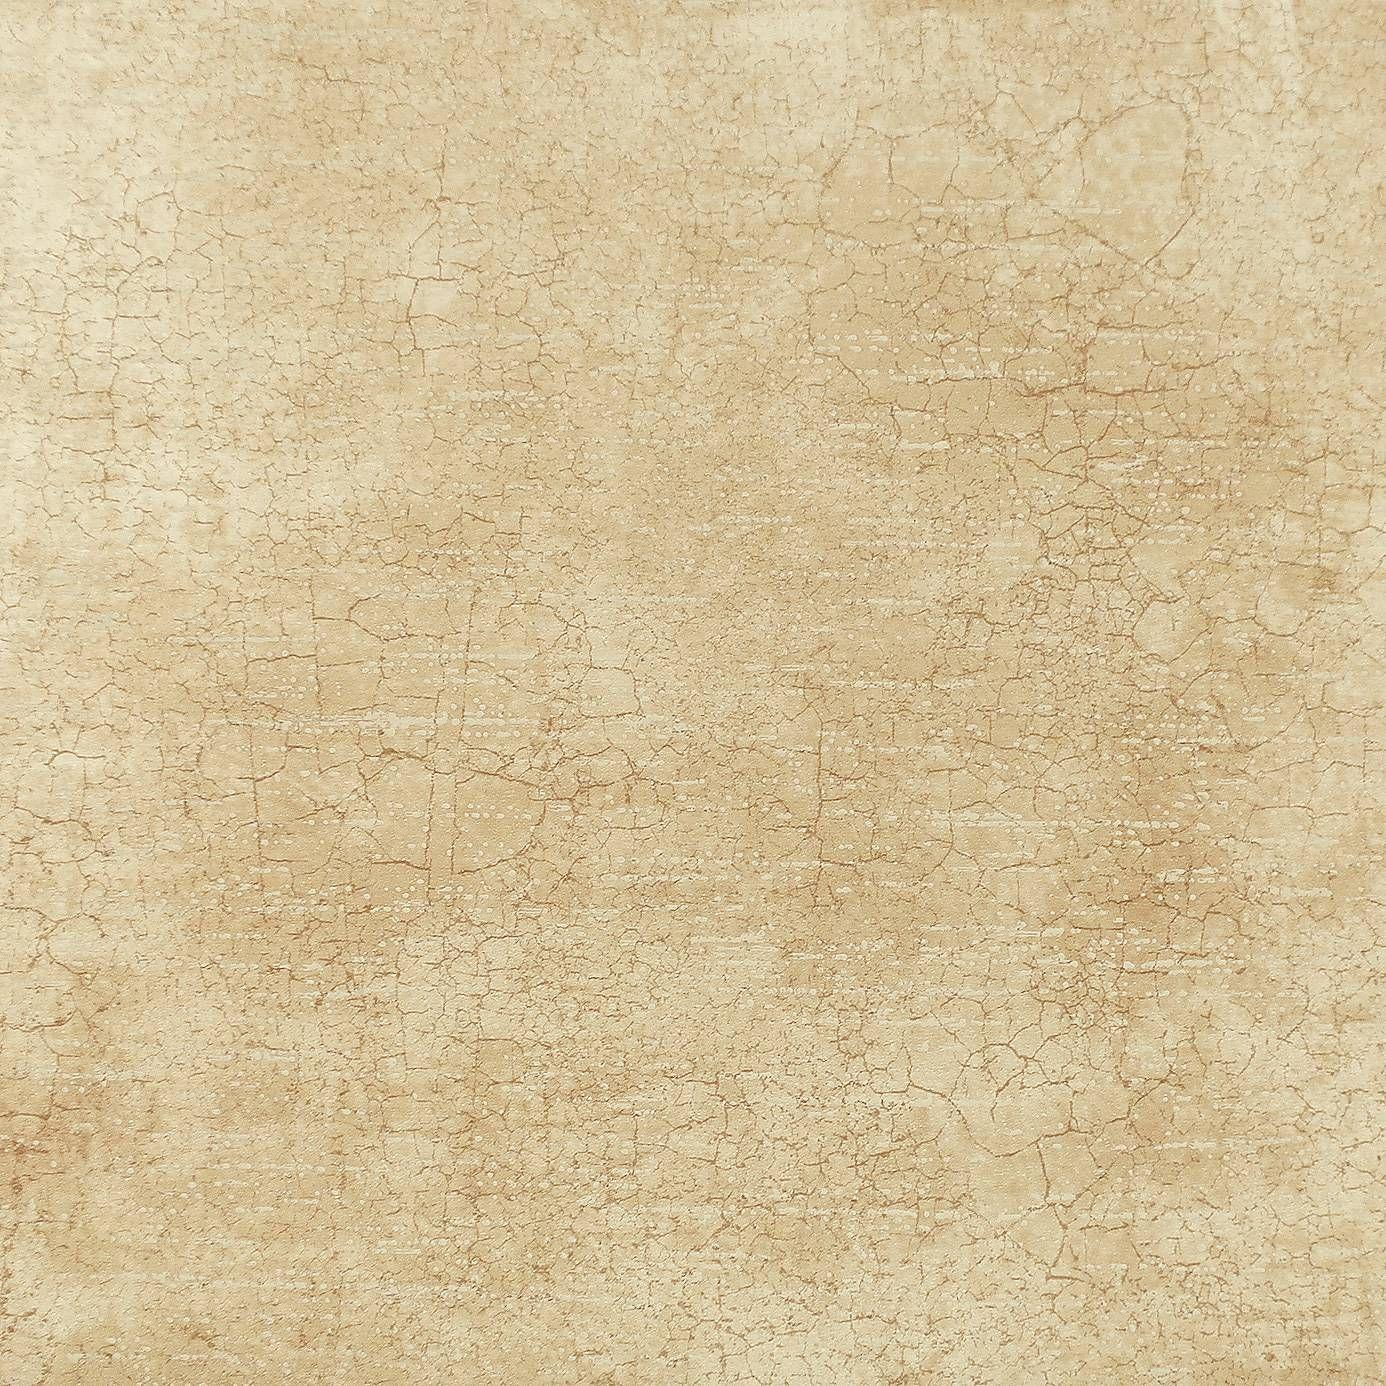 Wemyss Coating Wallpaper PuttyProduct Code COATING39